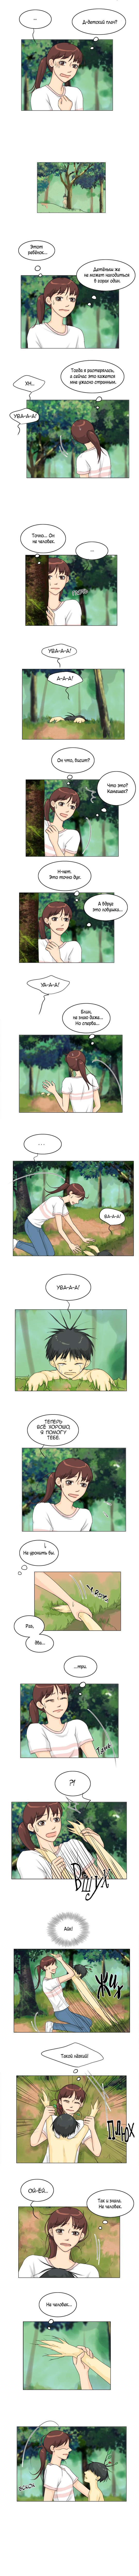 https://r1.ninemanga.com/comics/pic2/8/31048/426367/1535044486526.jpg Page 2